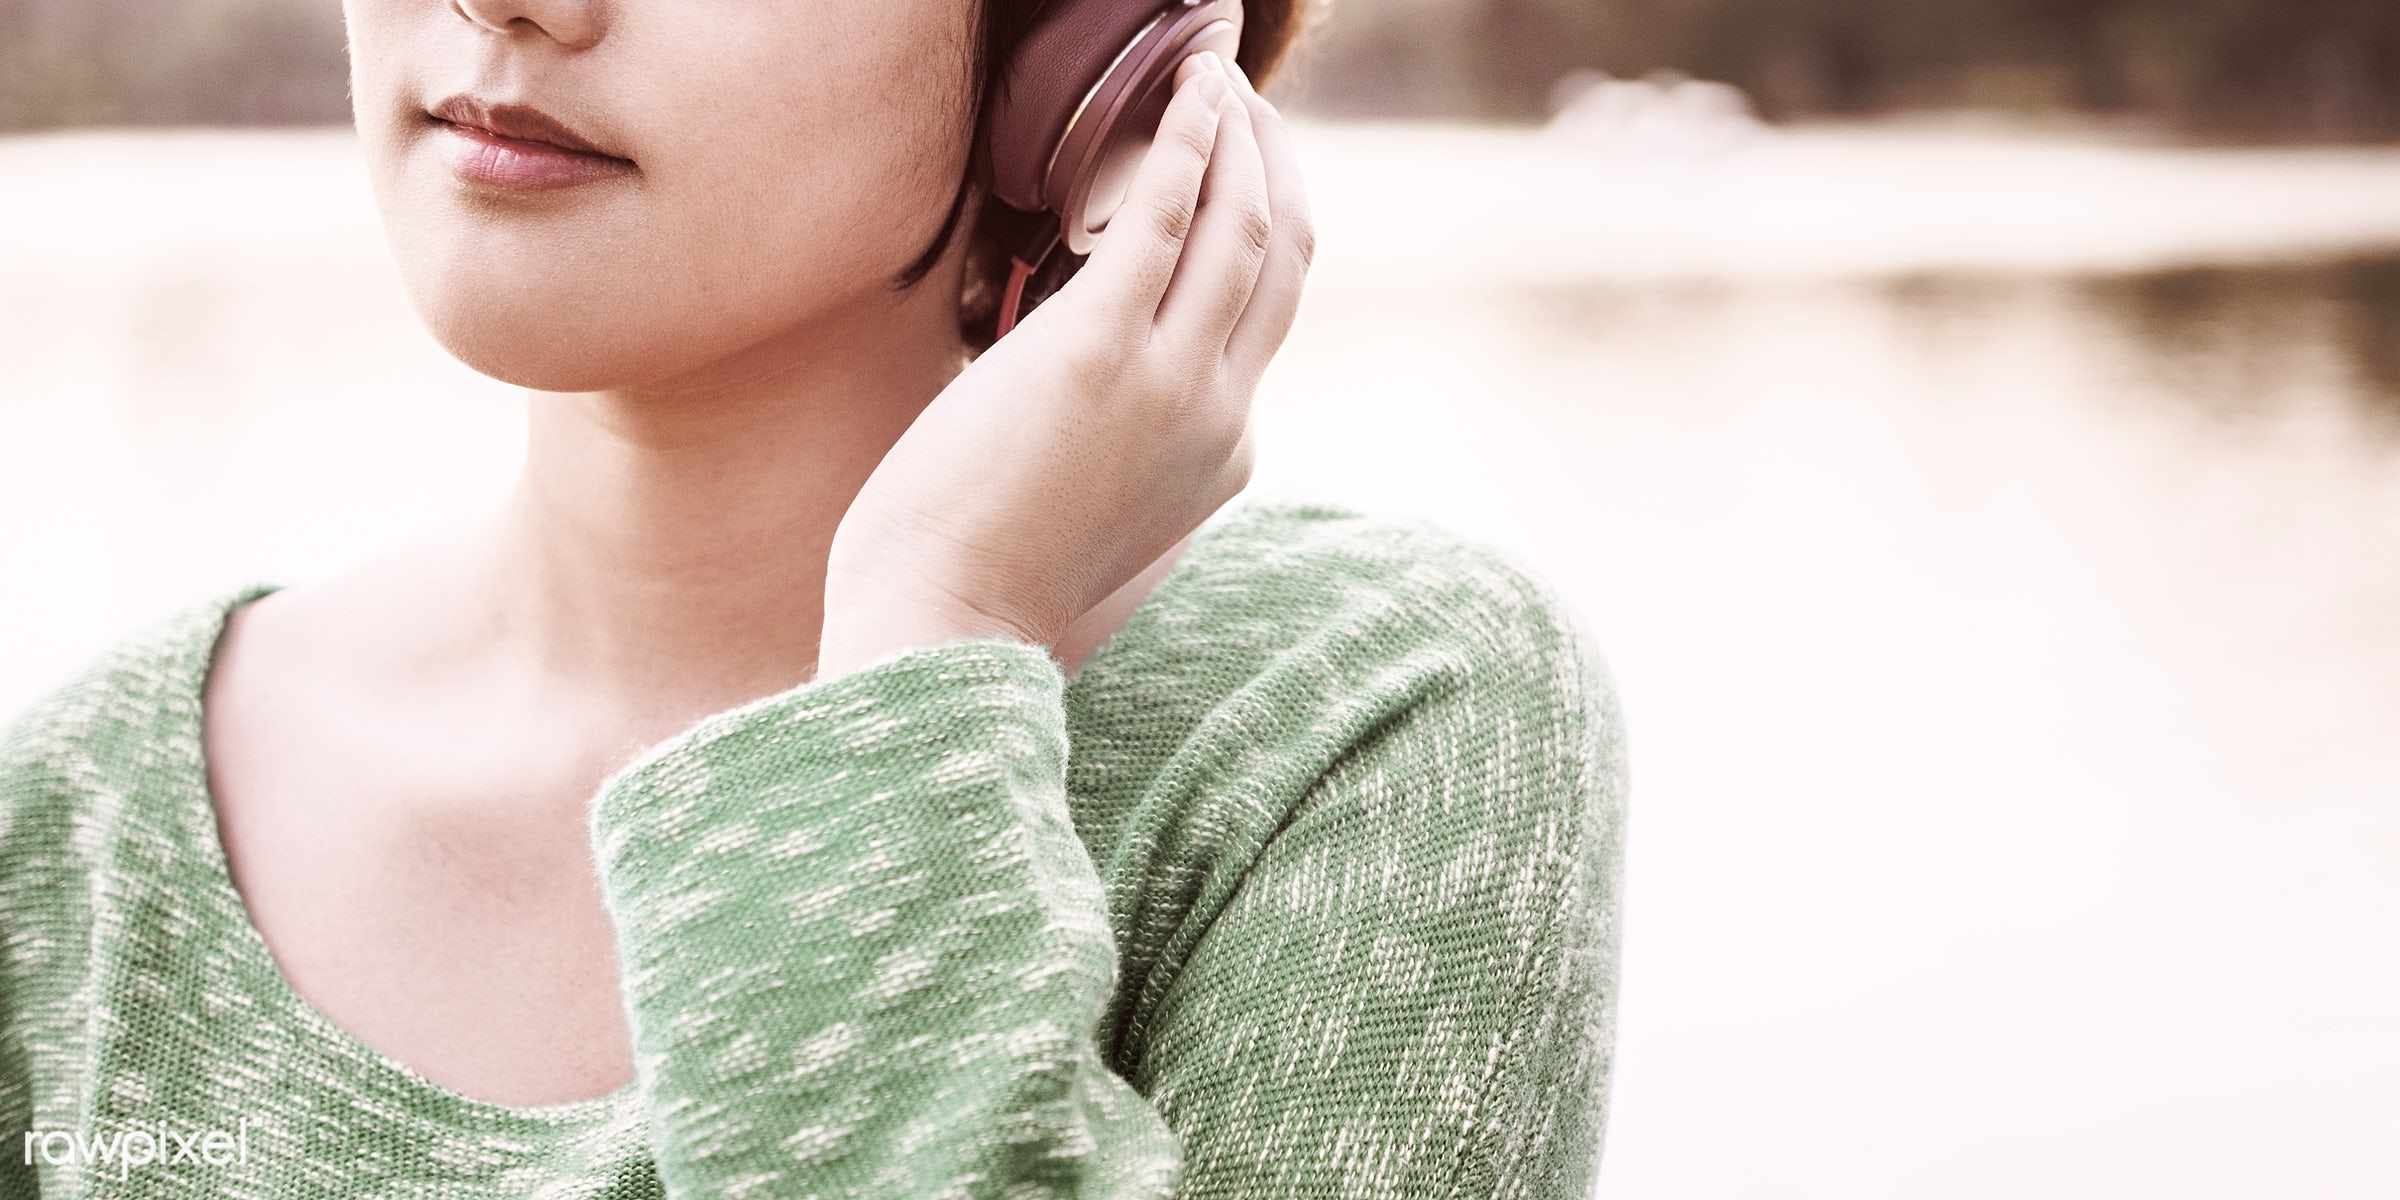 music, activity, asian ethnicity, audio equipment, calm, casual, chilling, earphones, electronic, enjoyment, entertainment,...